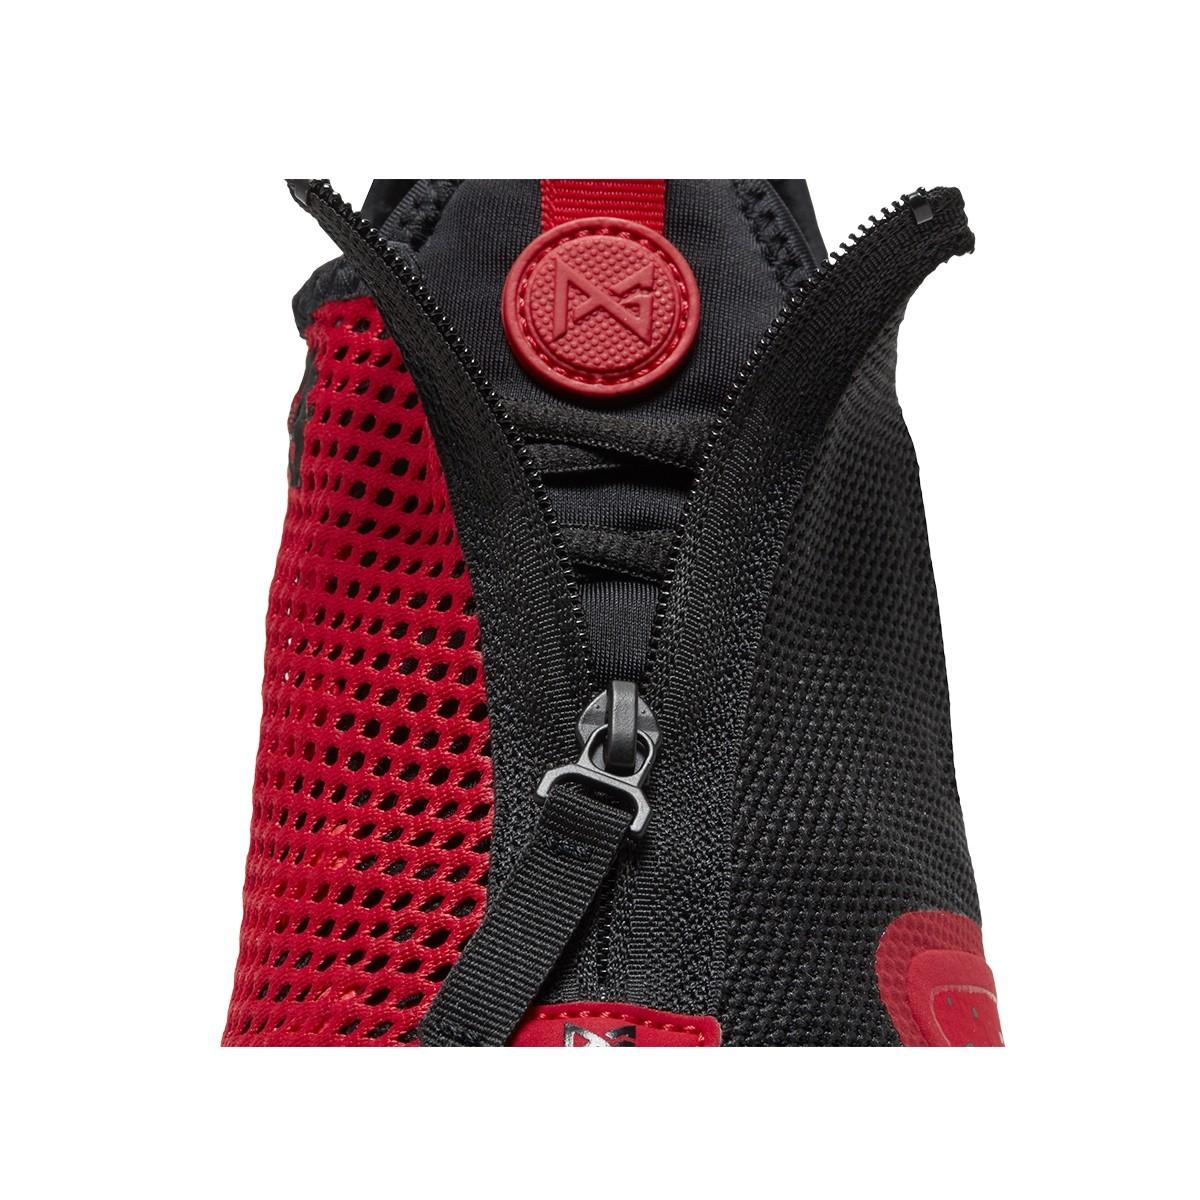 Comprar Nike PG 4 'Bred' CD5079-003